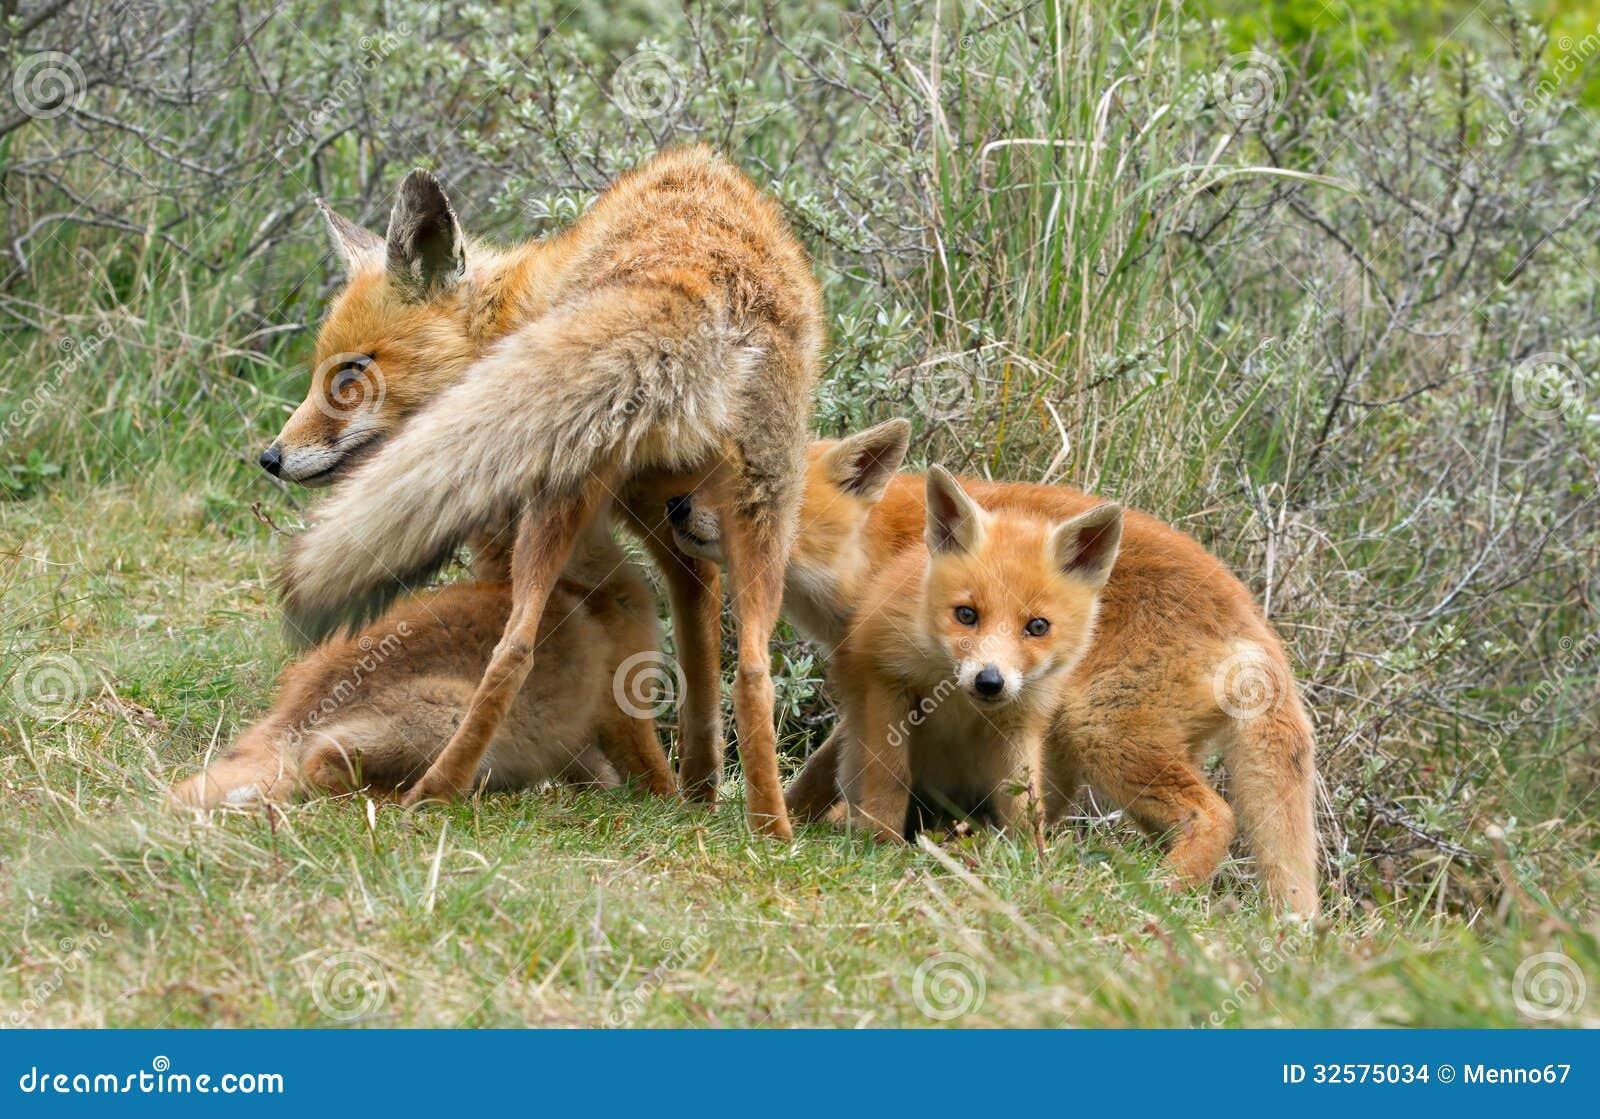 red fox cub stock images image 32575034 Artic Animals Arctic Animals Clip Art Black and White